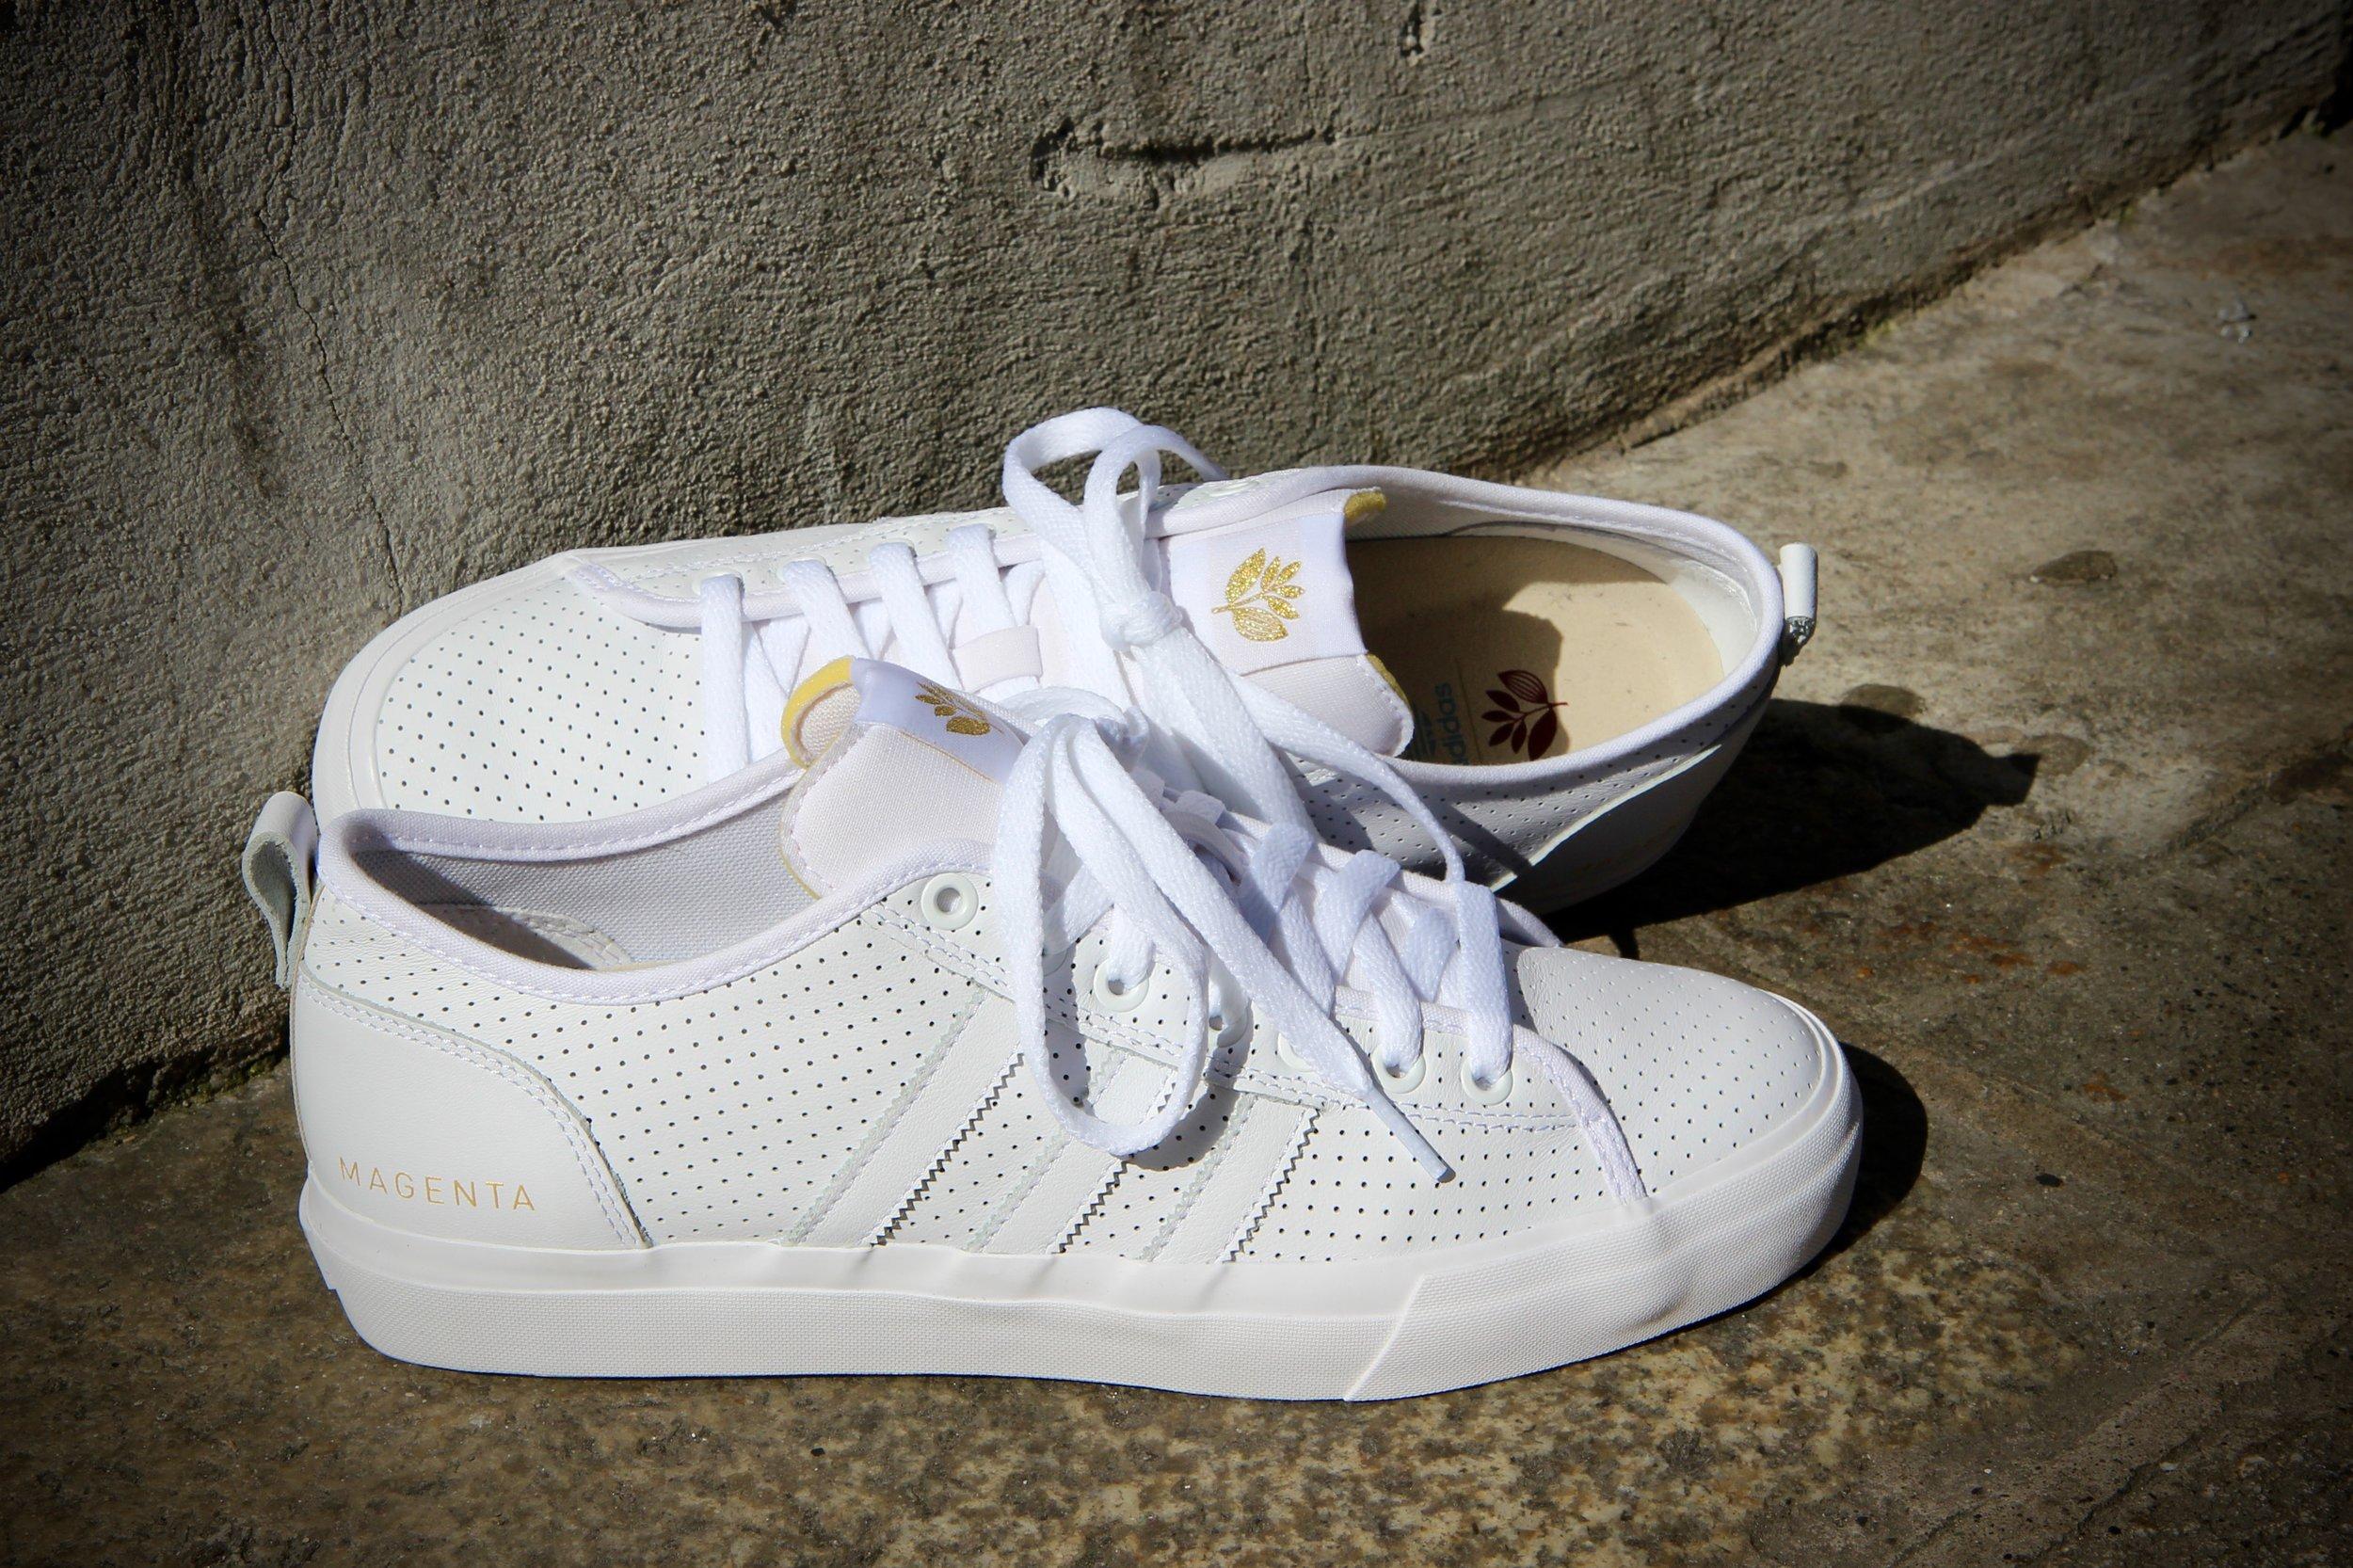 Adidas x Magenta Matchcourt Rx